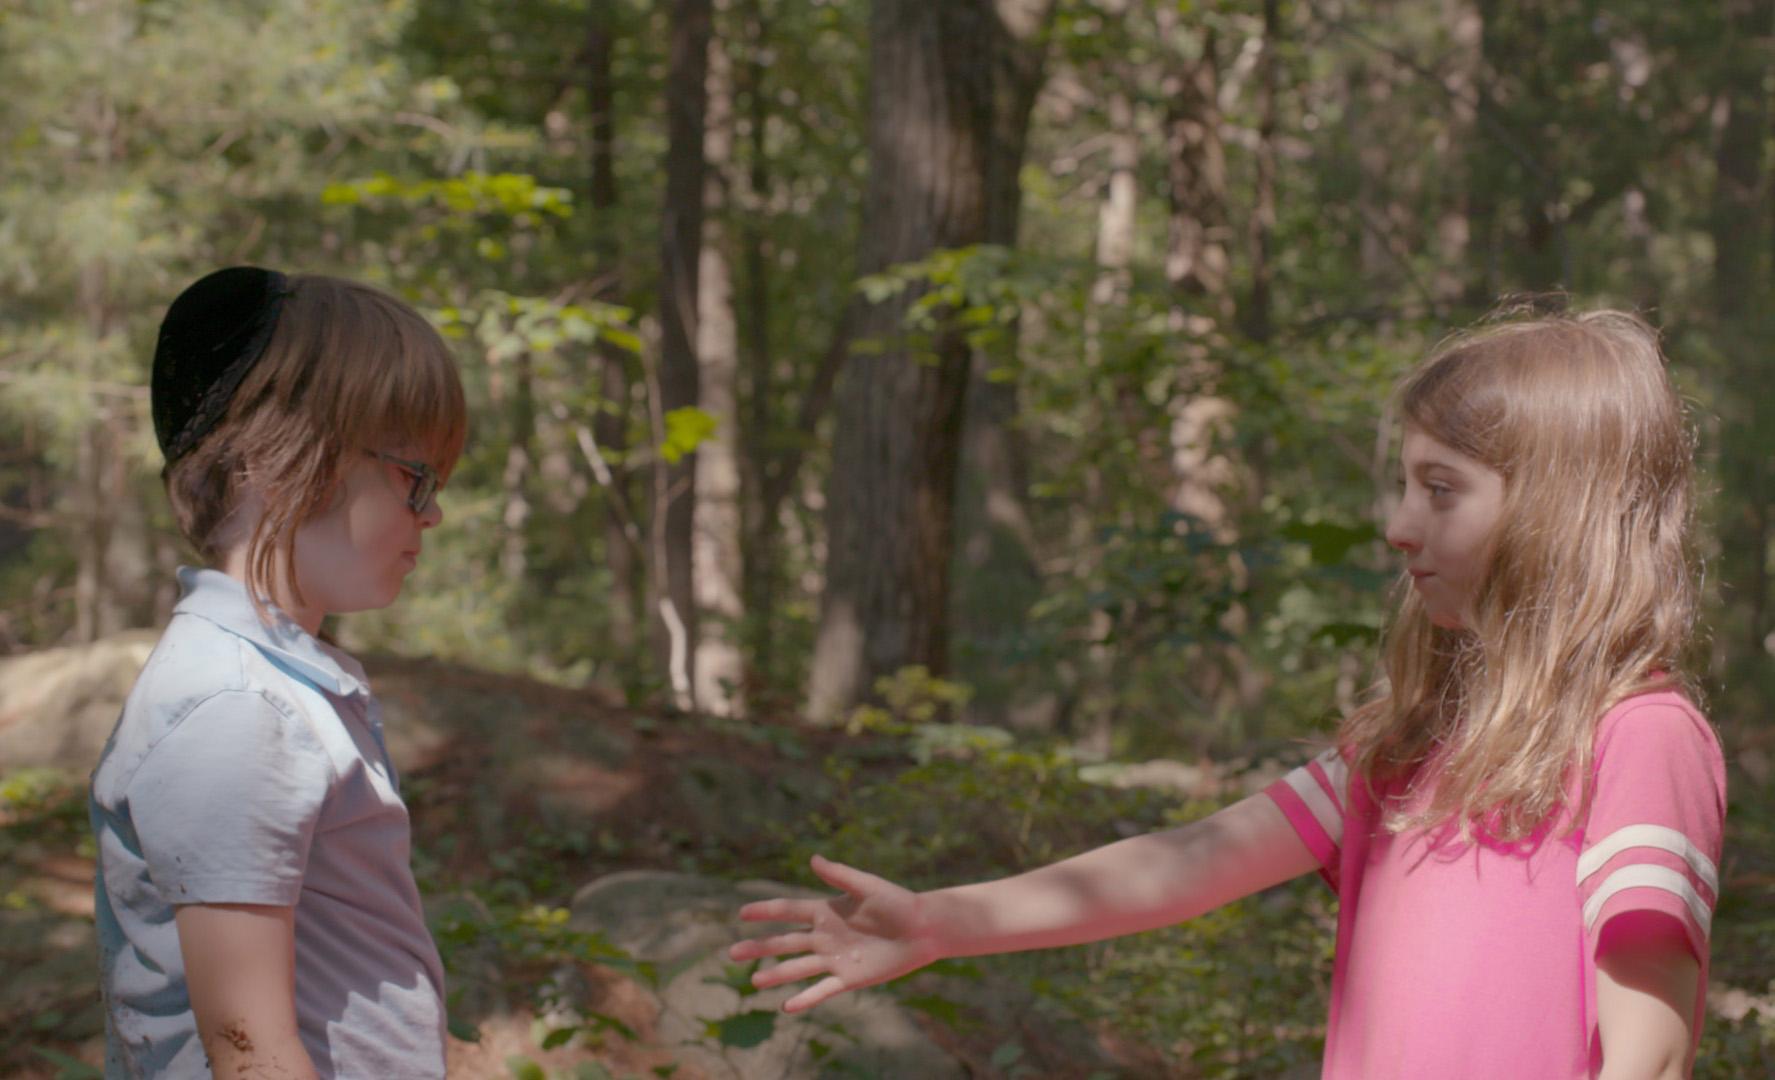 little girl extends hand to little boy in woods